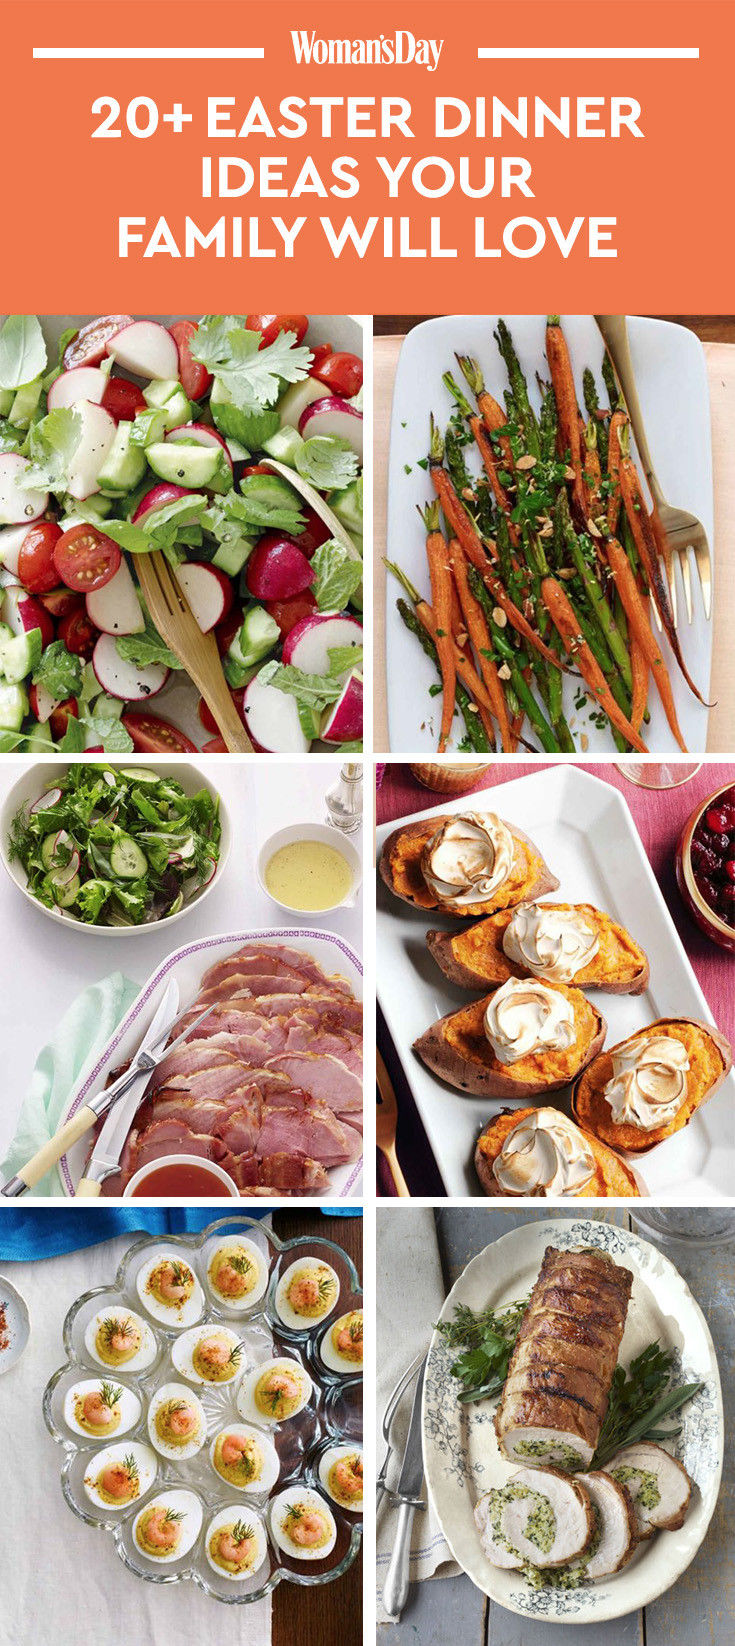 Suggestions For Easter Dinner  21 Easy Easter Dinner Ideas Recipes for the Best Easter